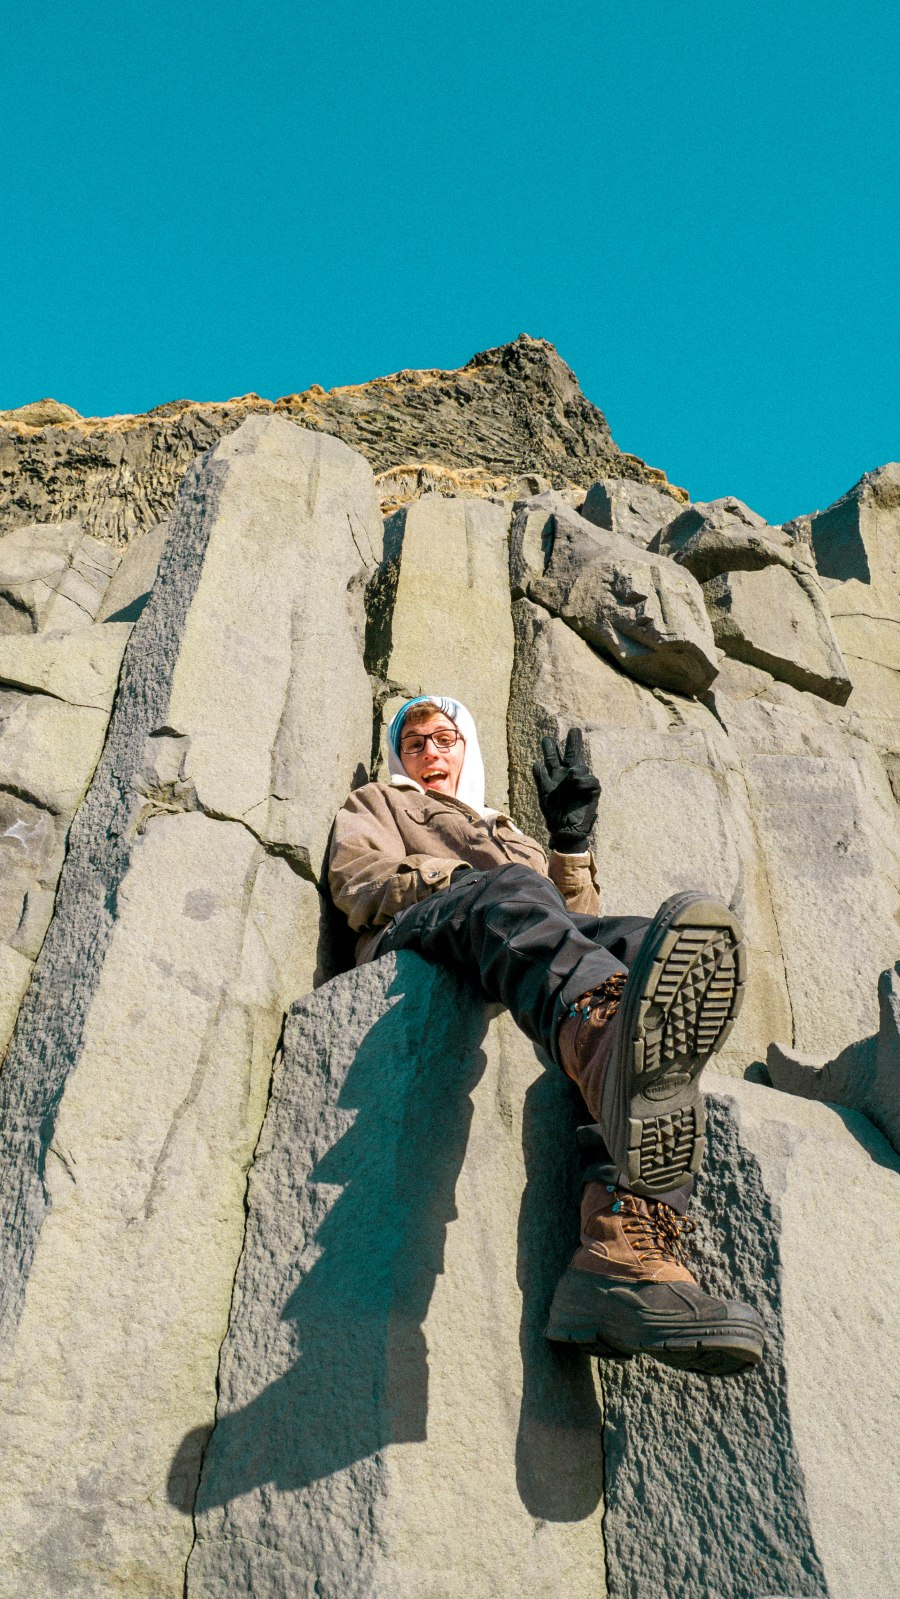 ryan rock 2